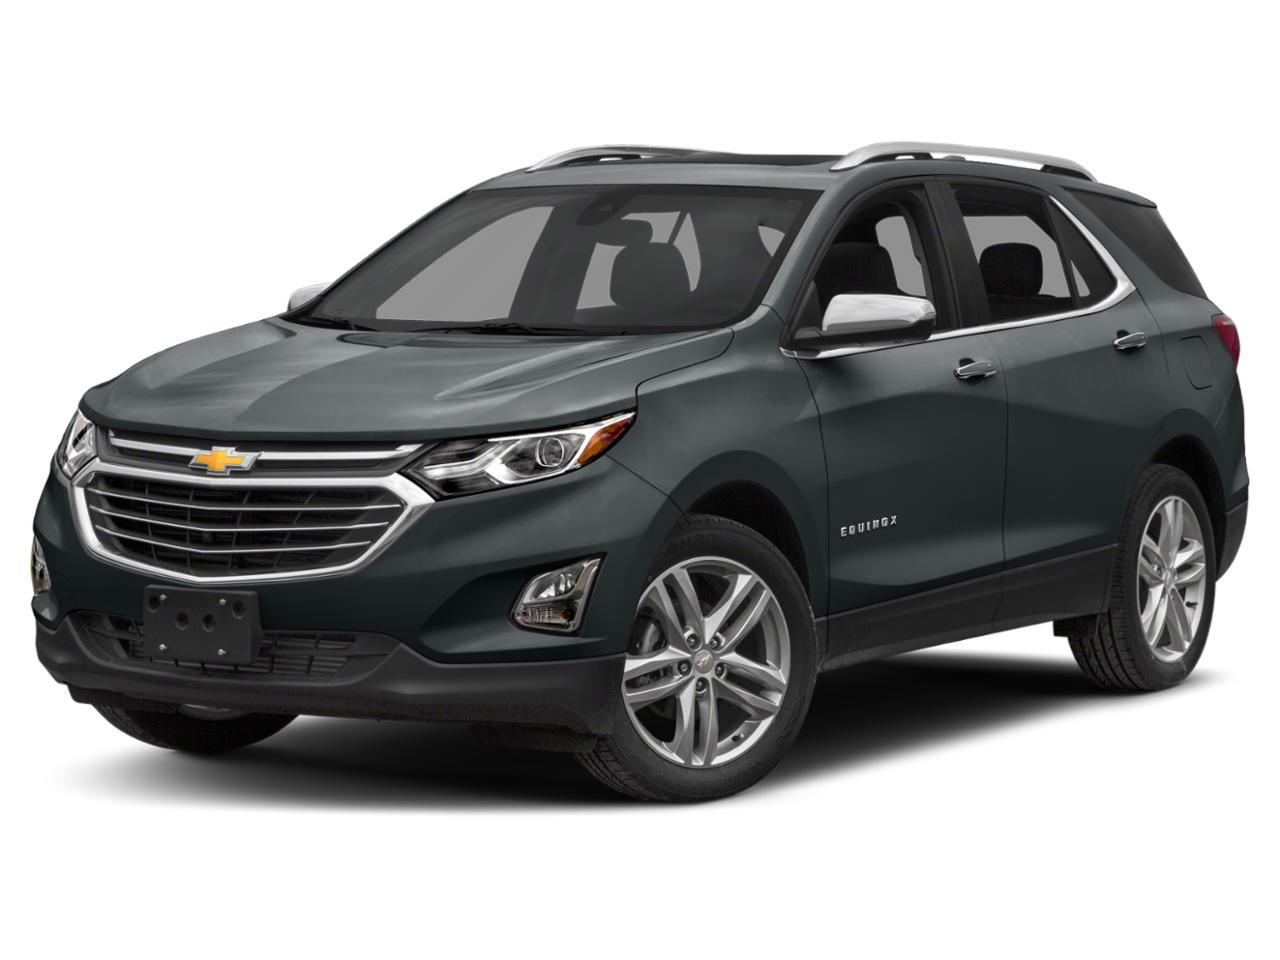 Nightfall Gray Metallic 2018 Chevrolet Equinox PREMIER SUV Wake Forest NC